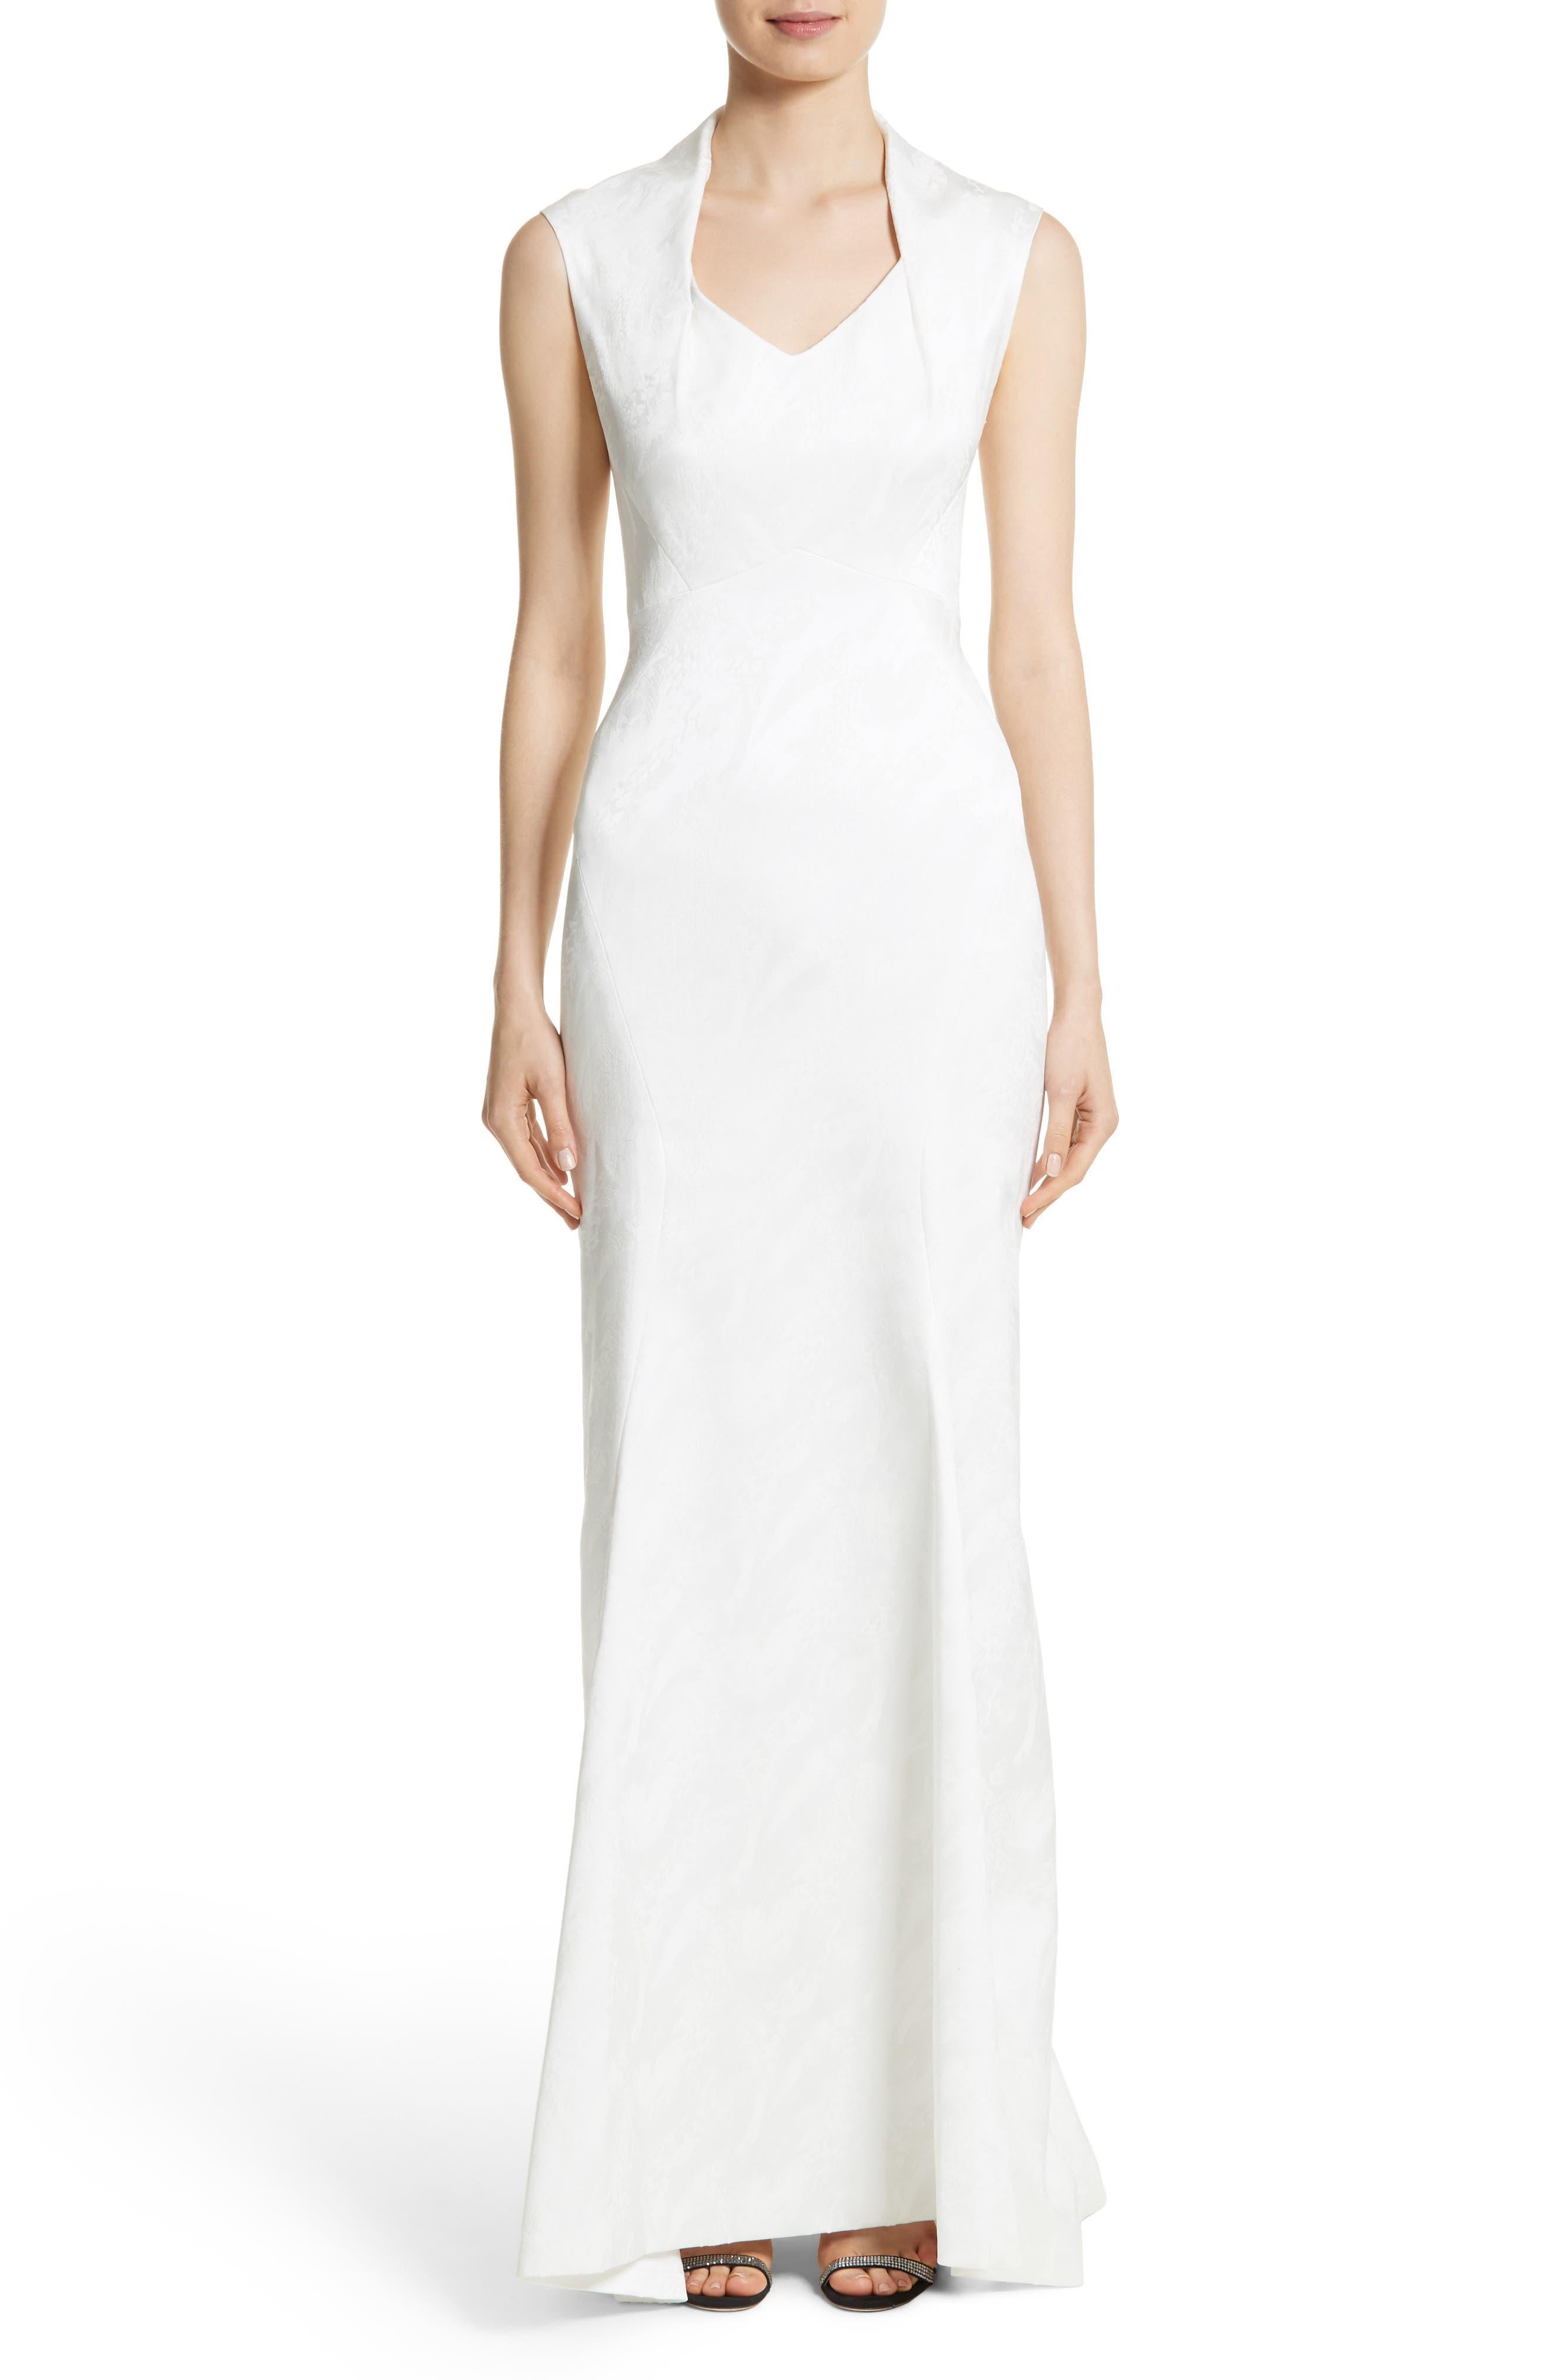 Alternate Image 1 Selected - Zac Posen Sleeveless Jacquard Gown